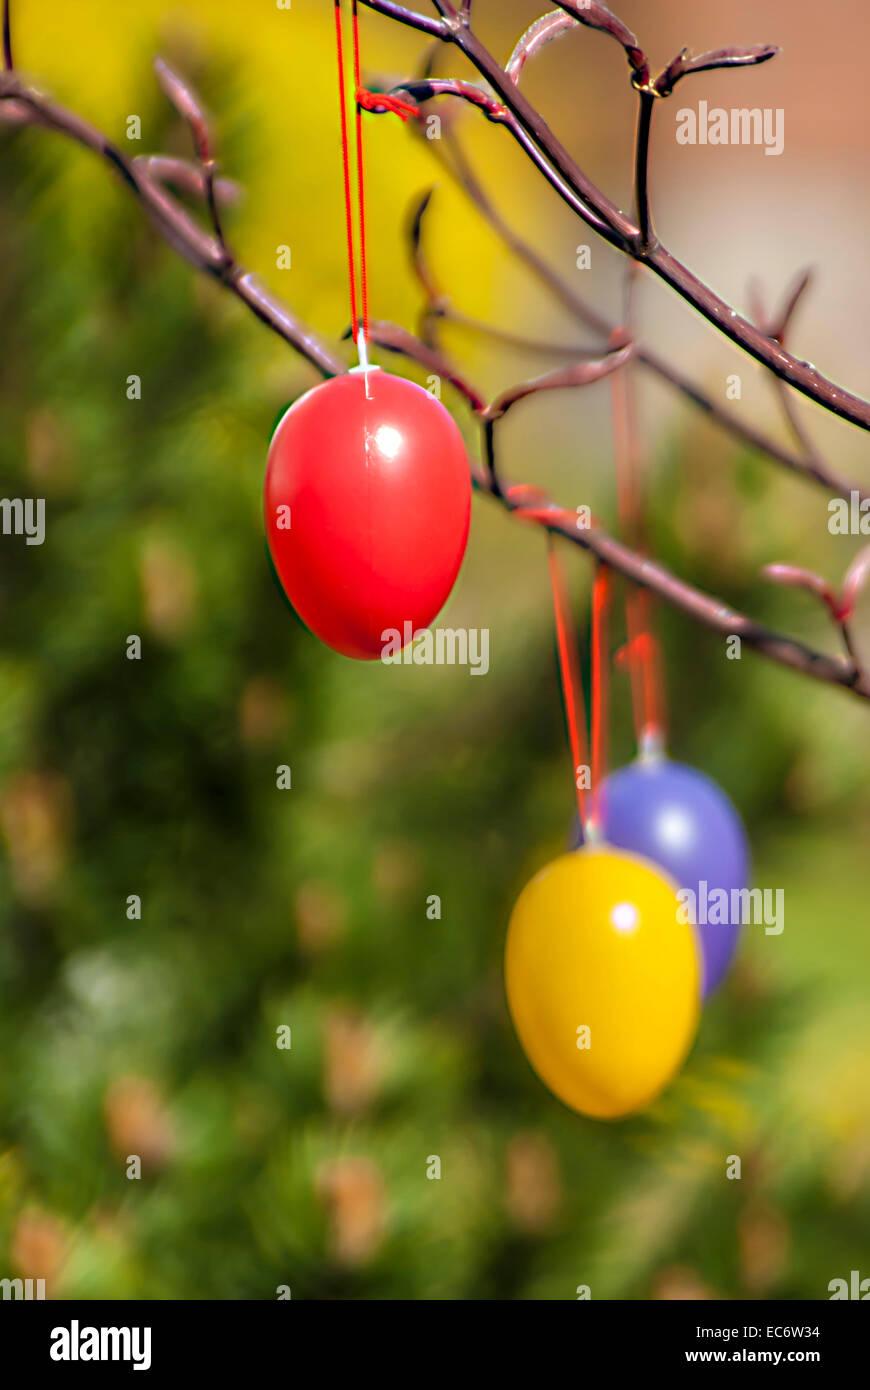 hang, Easter Egg, bemahlt, colorful 2 - Stock Image